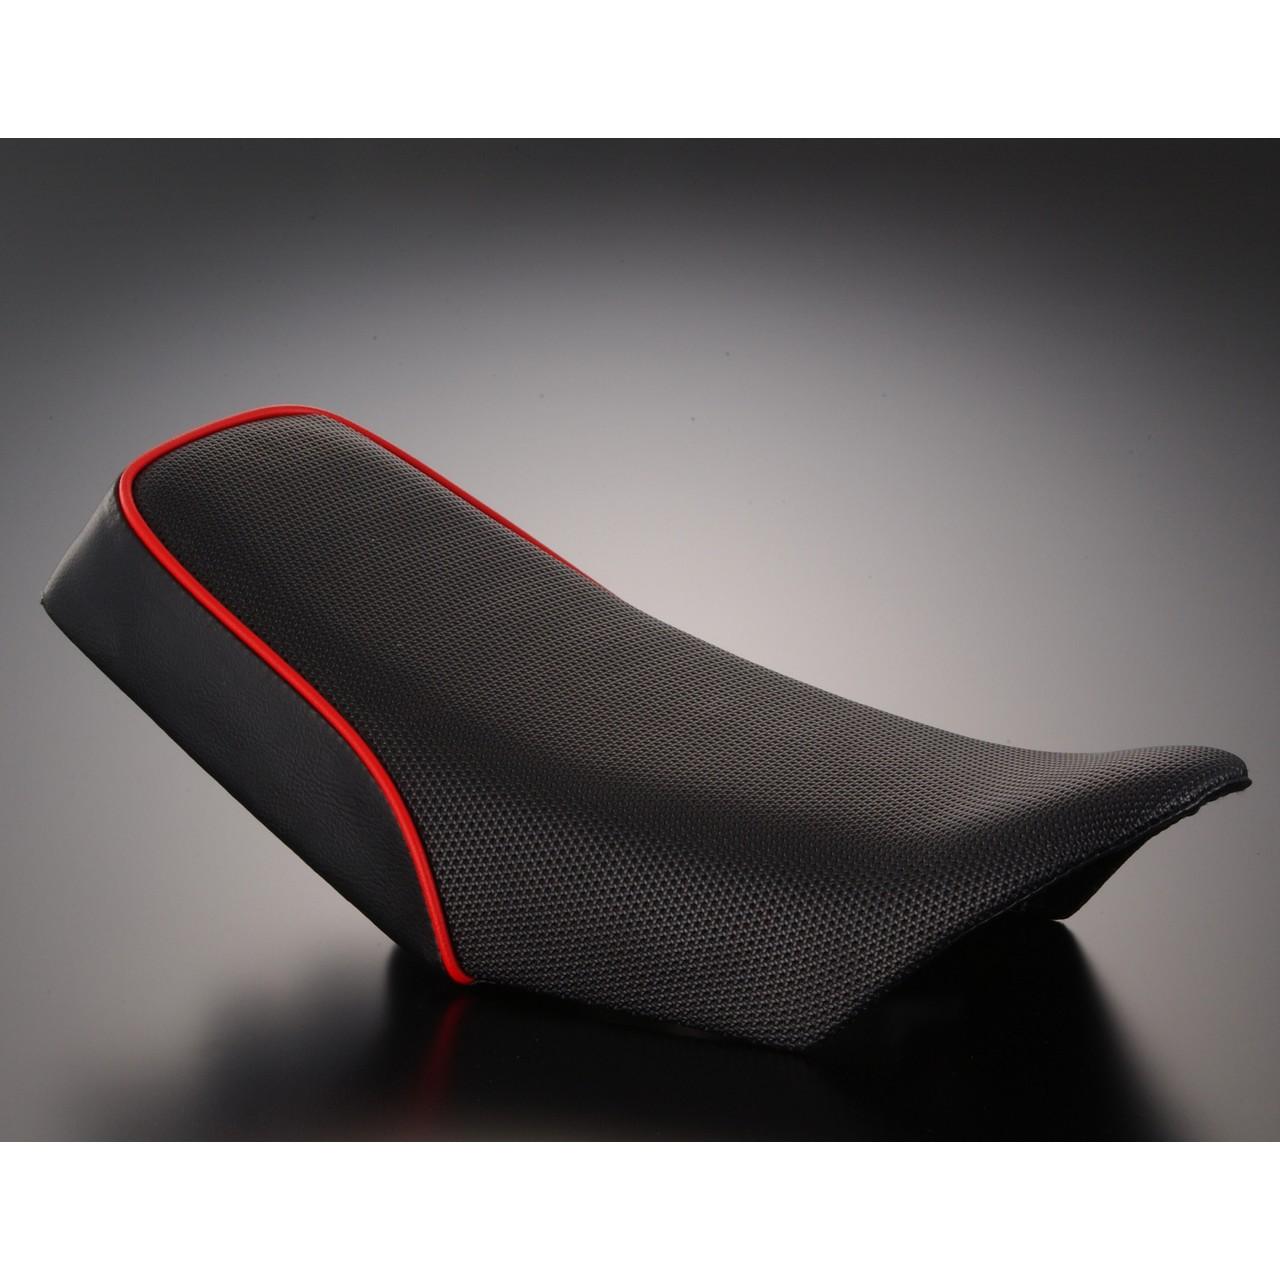 【G-Craft】Custom 坐墊 MX (黑色/紅色滾邊) - 「Webike-摩托百貨」